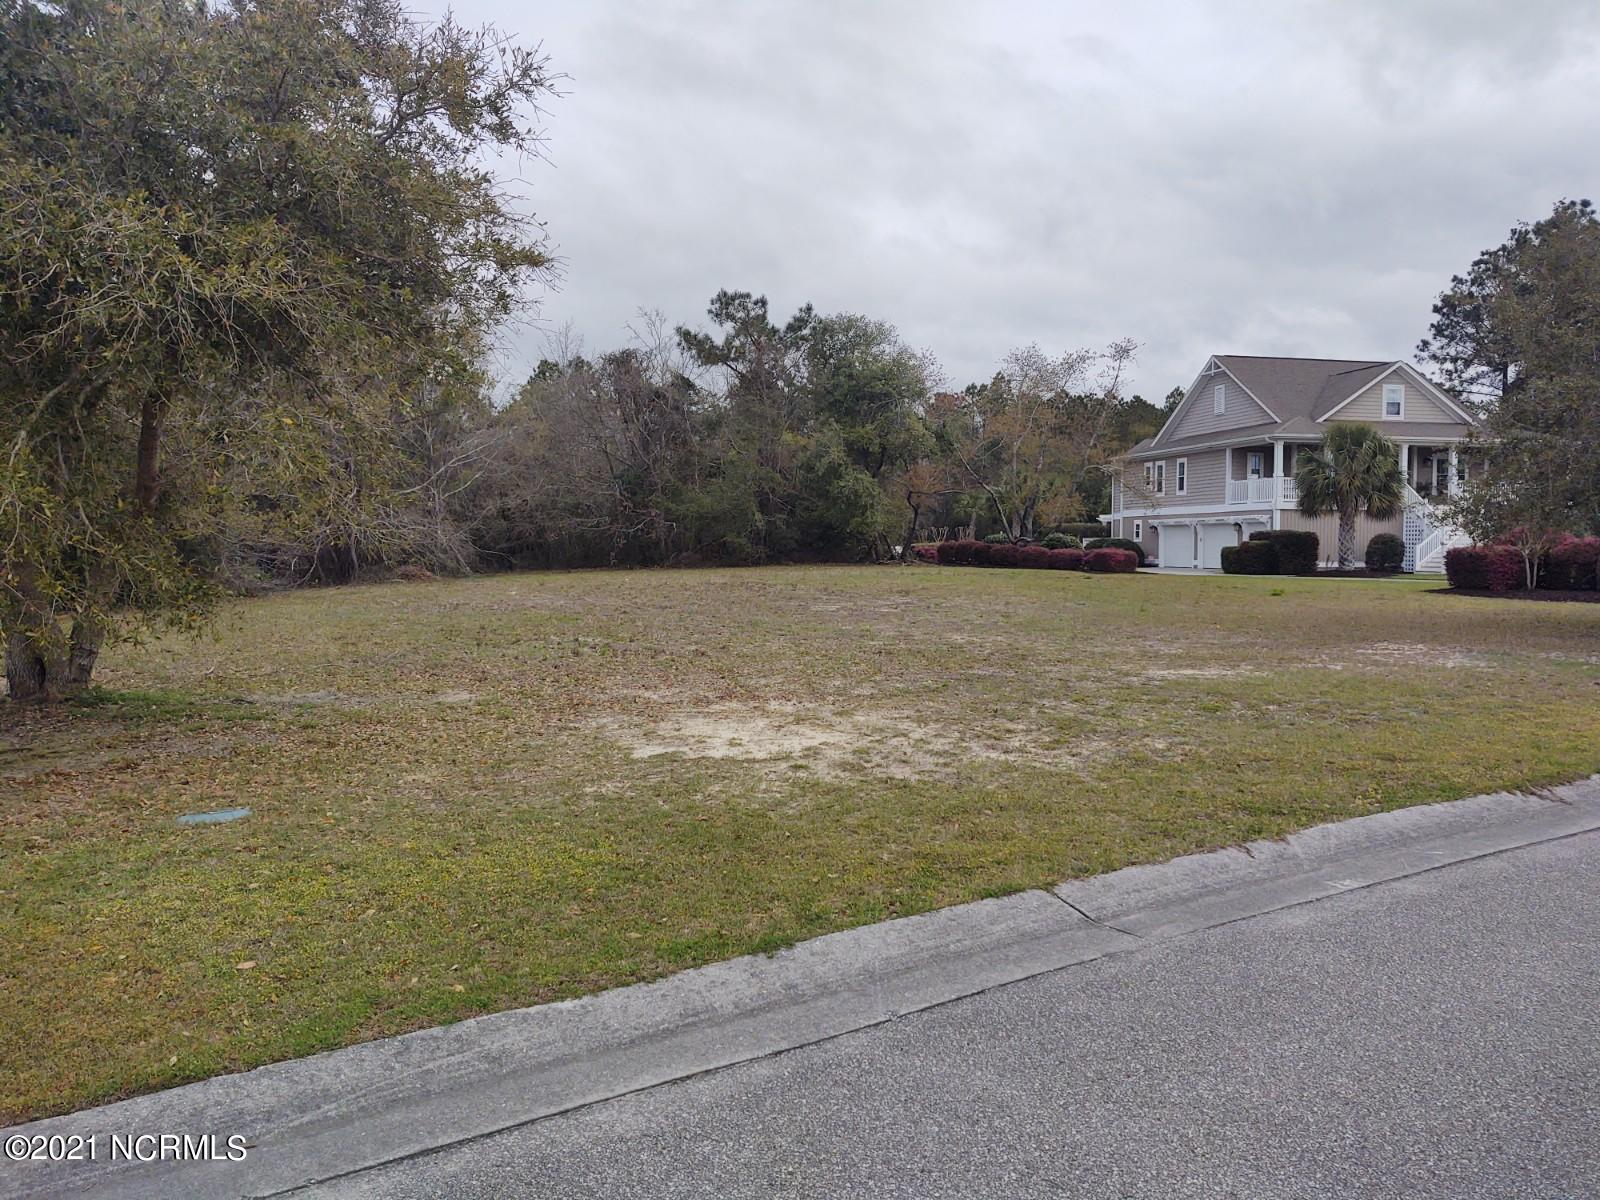 Lot 9 Crane Pointe Road, Hampstead, North Carolina 28443, ,Residential land,For sale,Crane Pointe,100264222